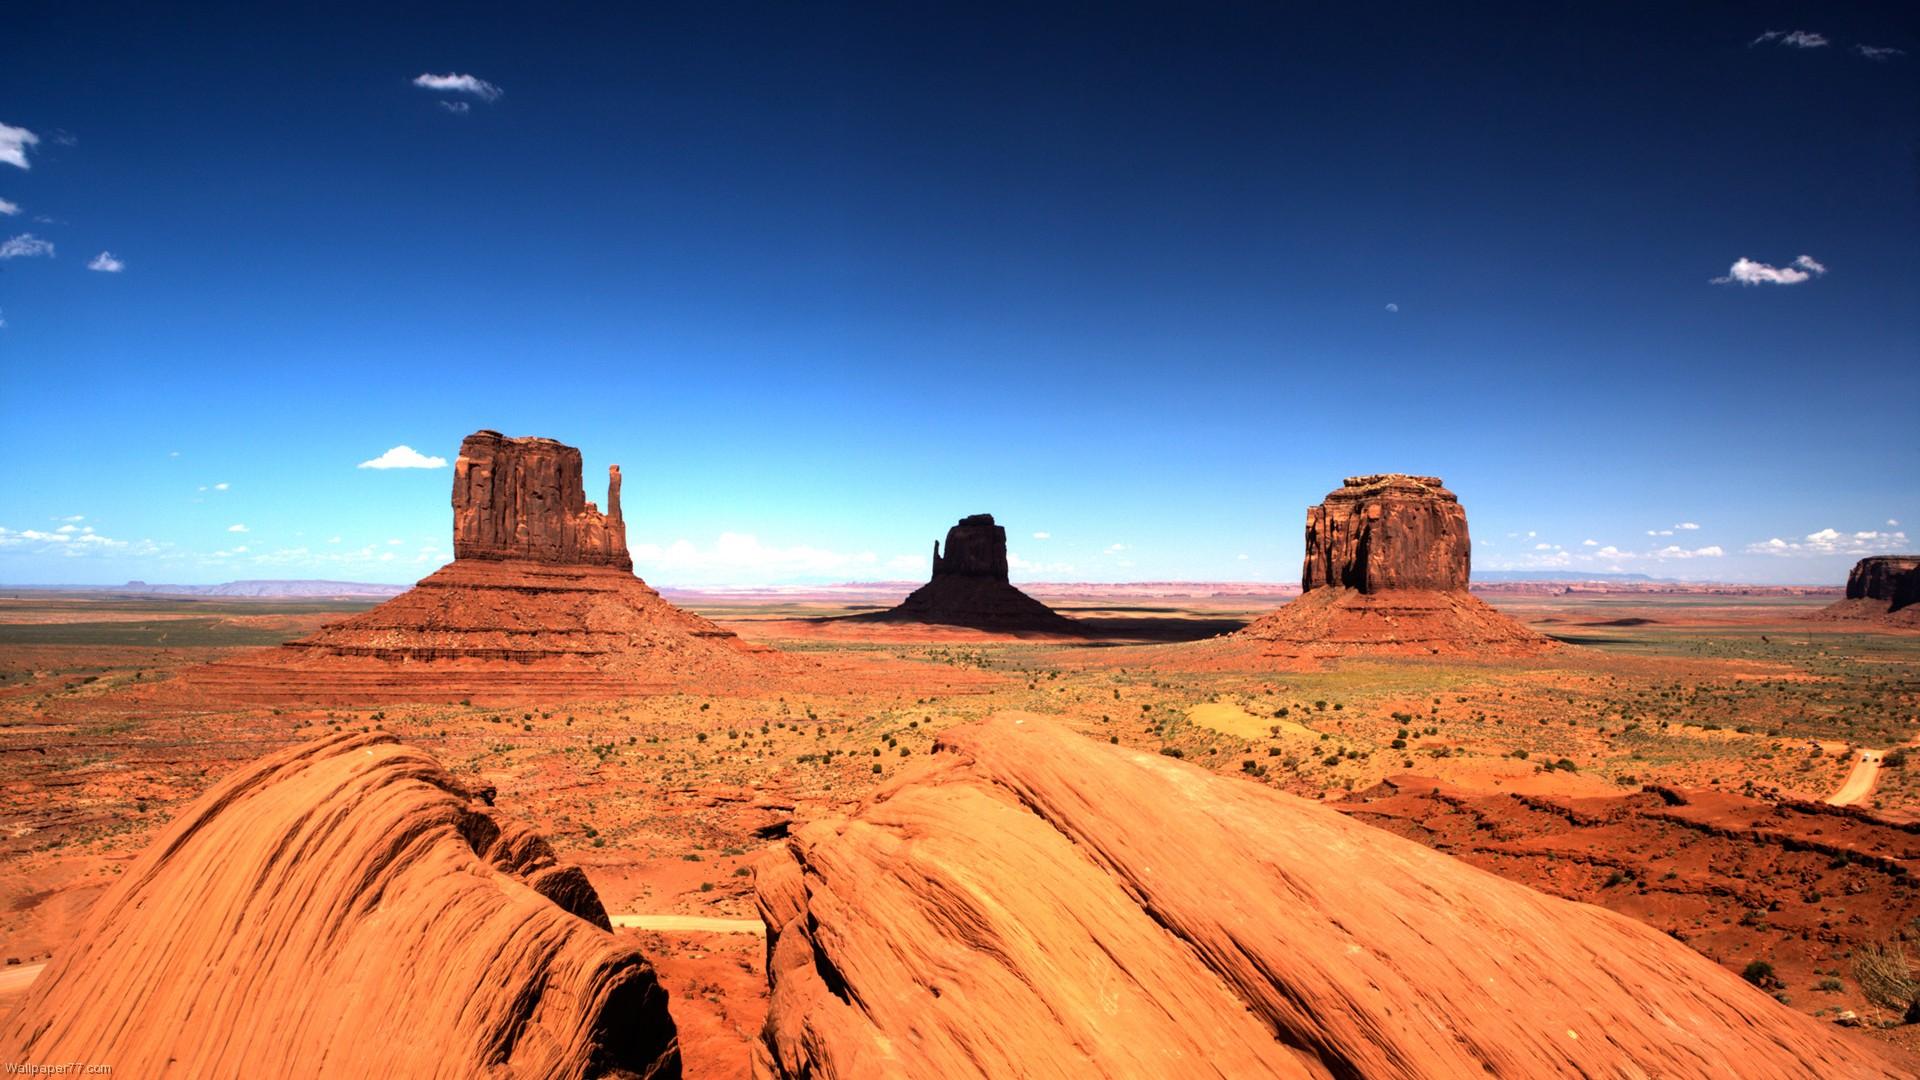 Desert Landscape Wallpaper Background 1 HD Wallpapers